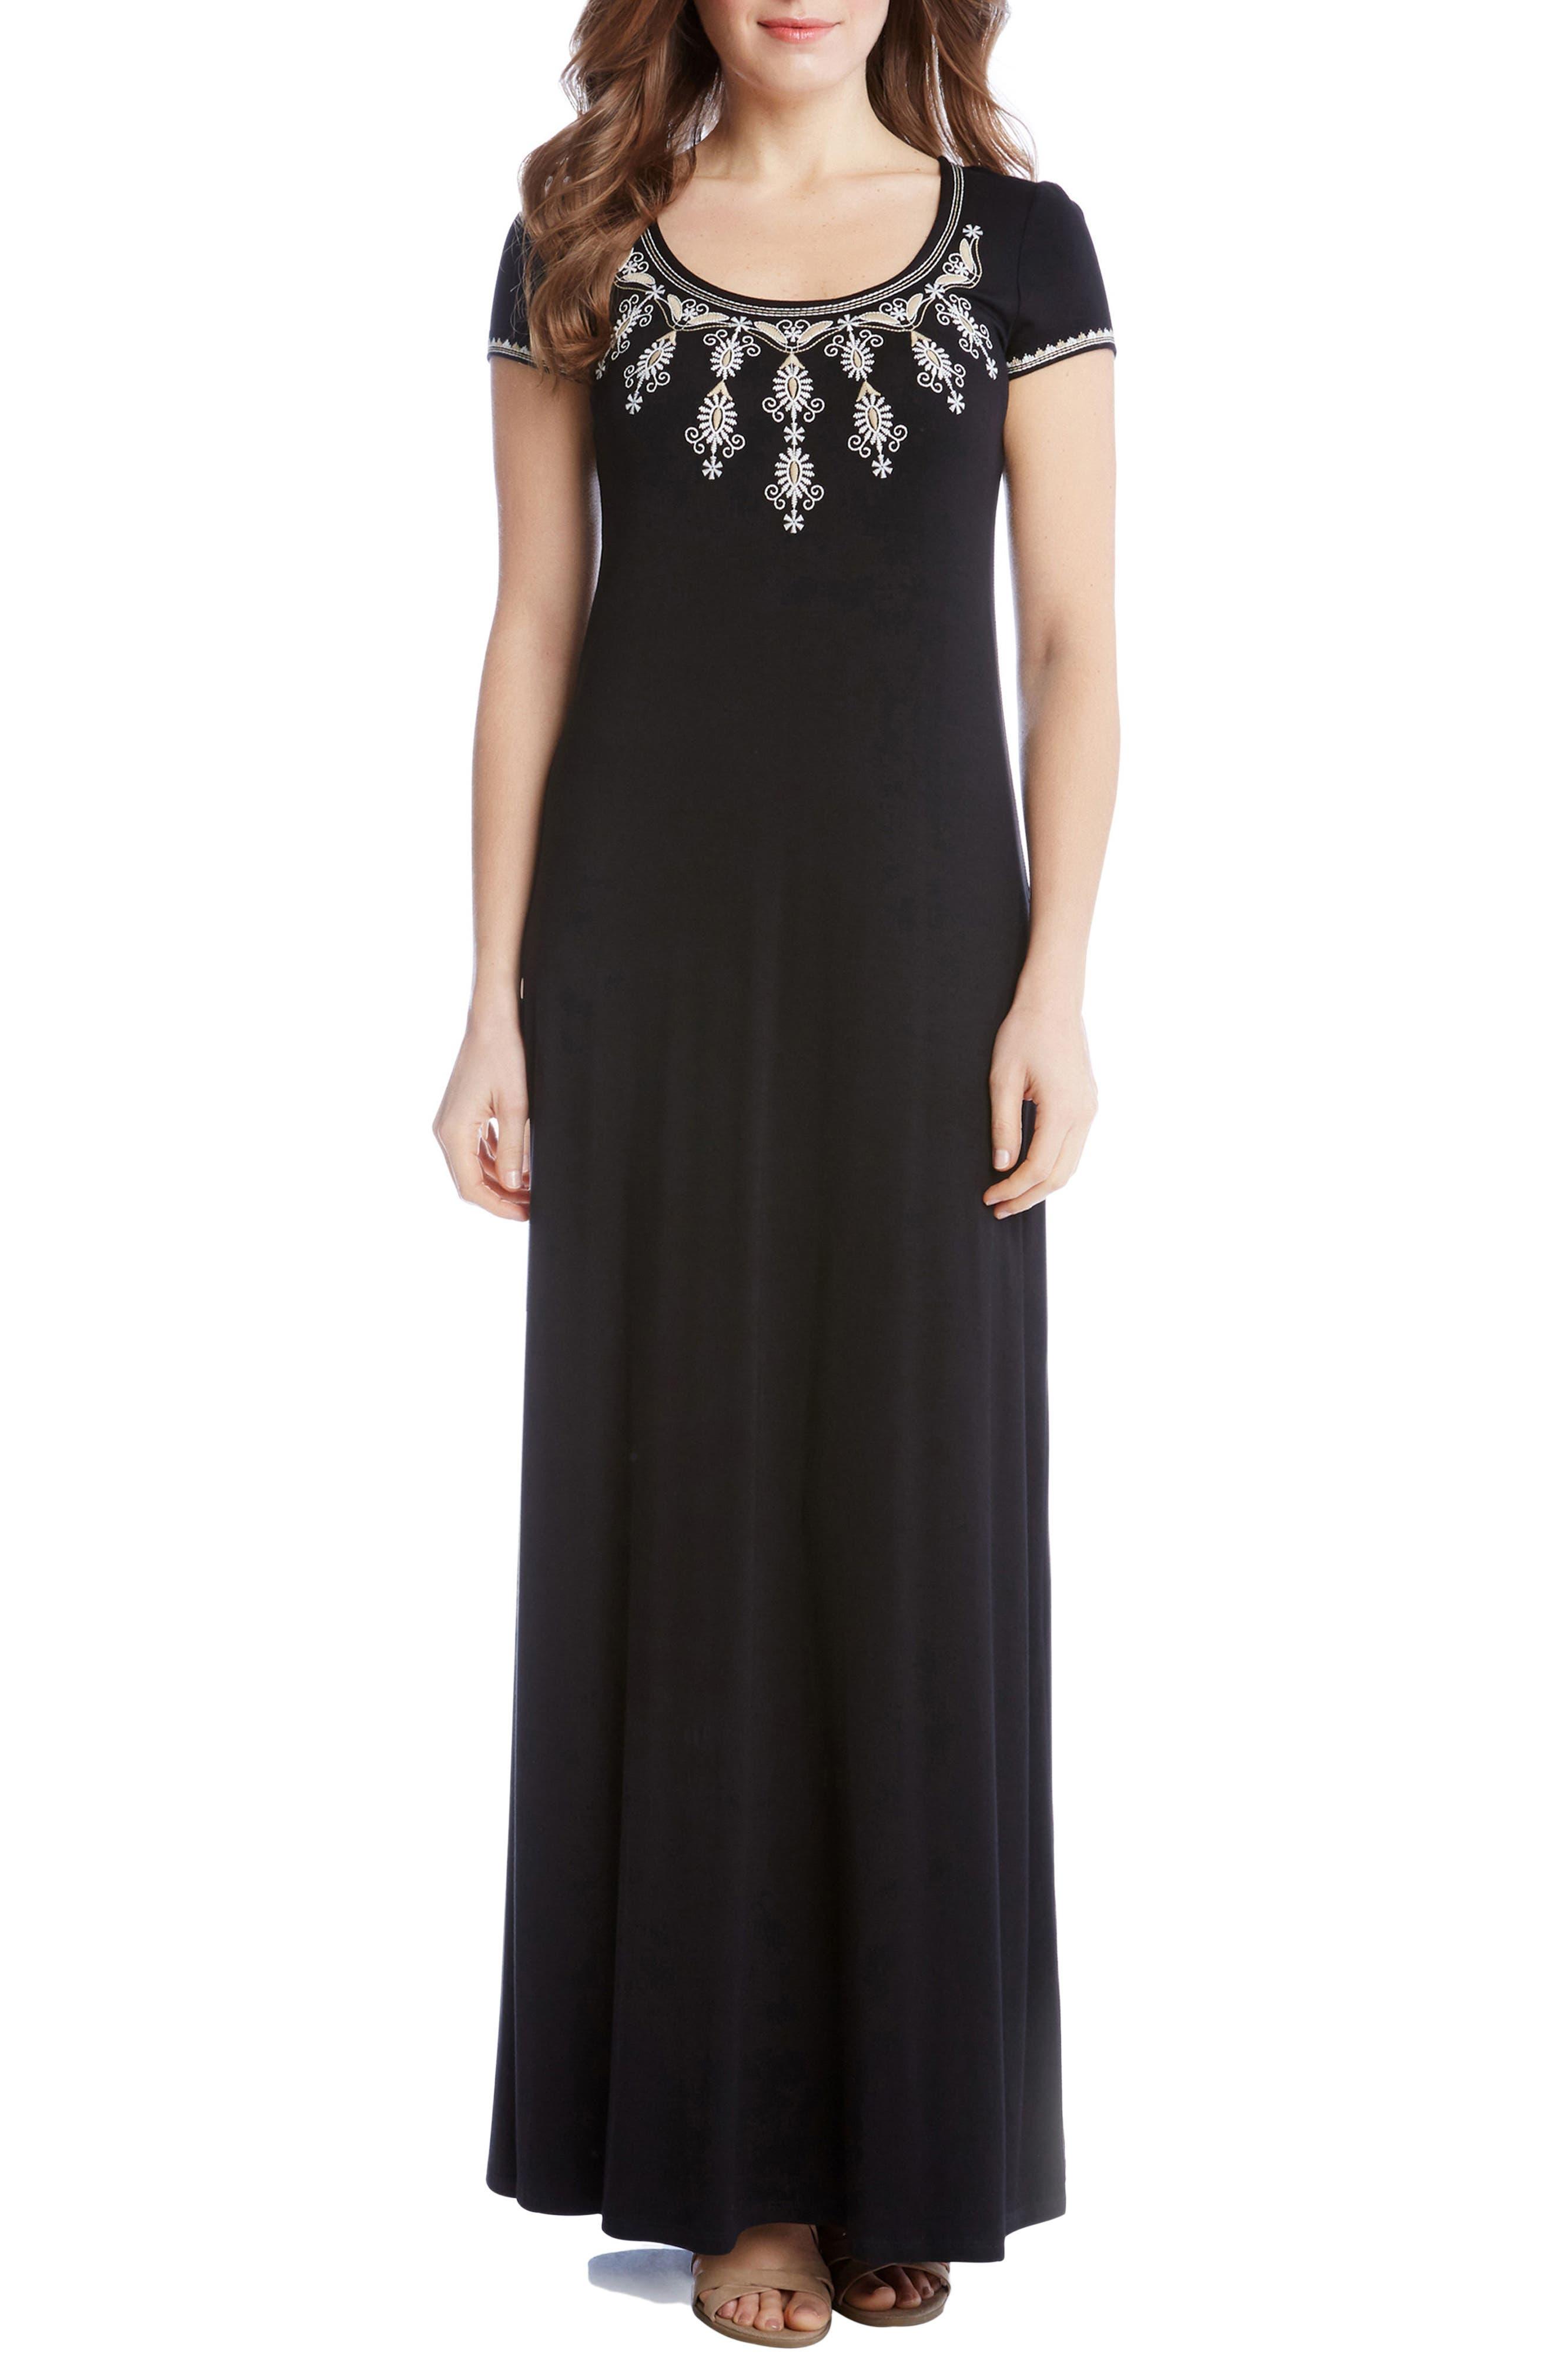 Main Image - Karen Kane Embroidered Cap Sleeve Maxi Dress